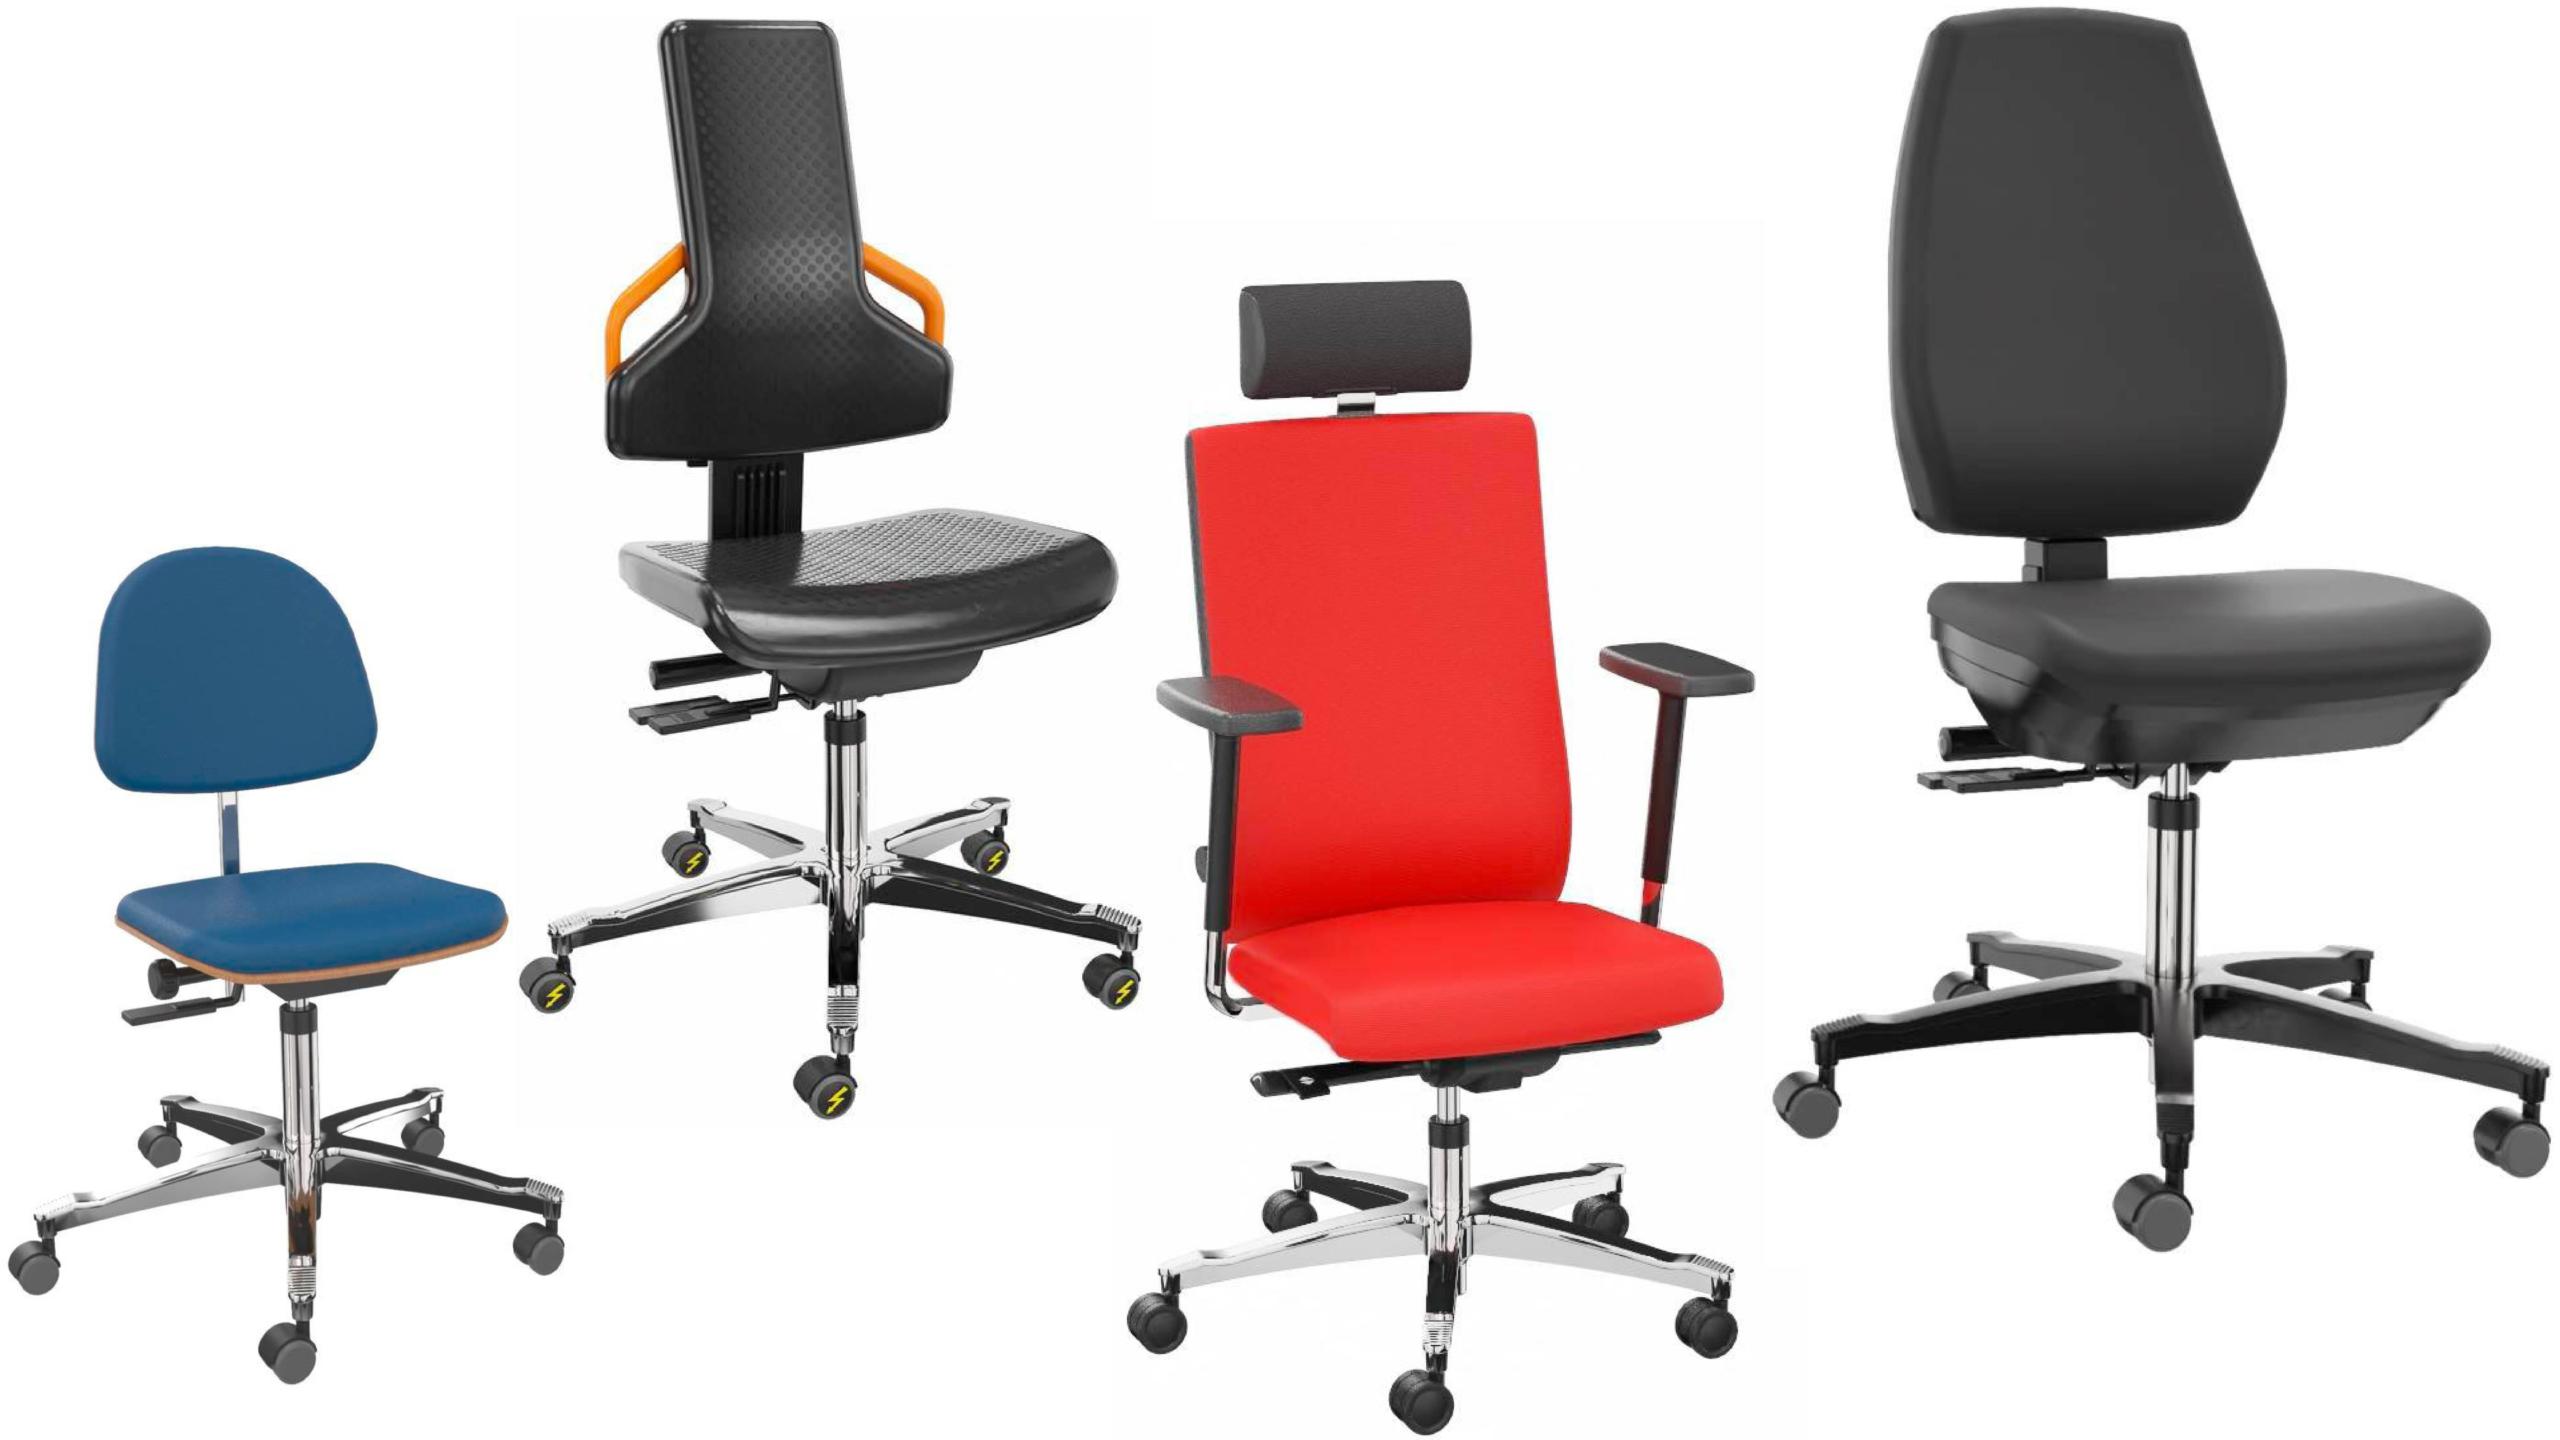 Fire arbejdsstole fra DENIOS